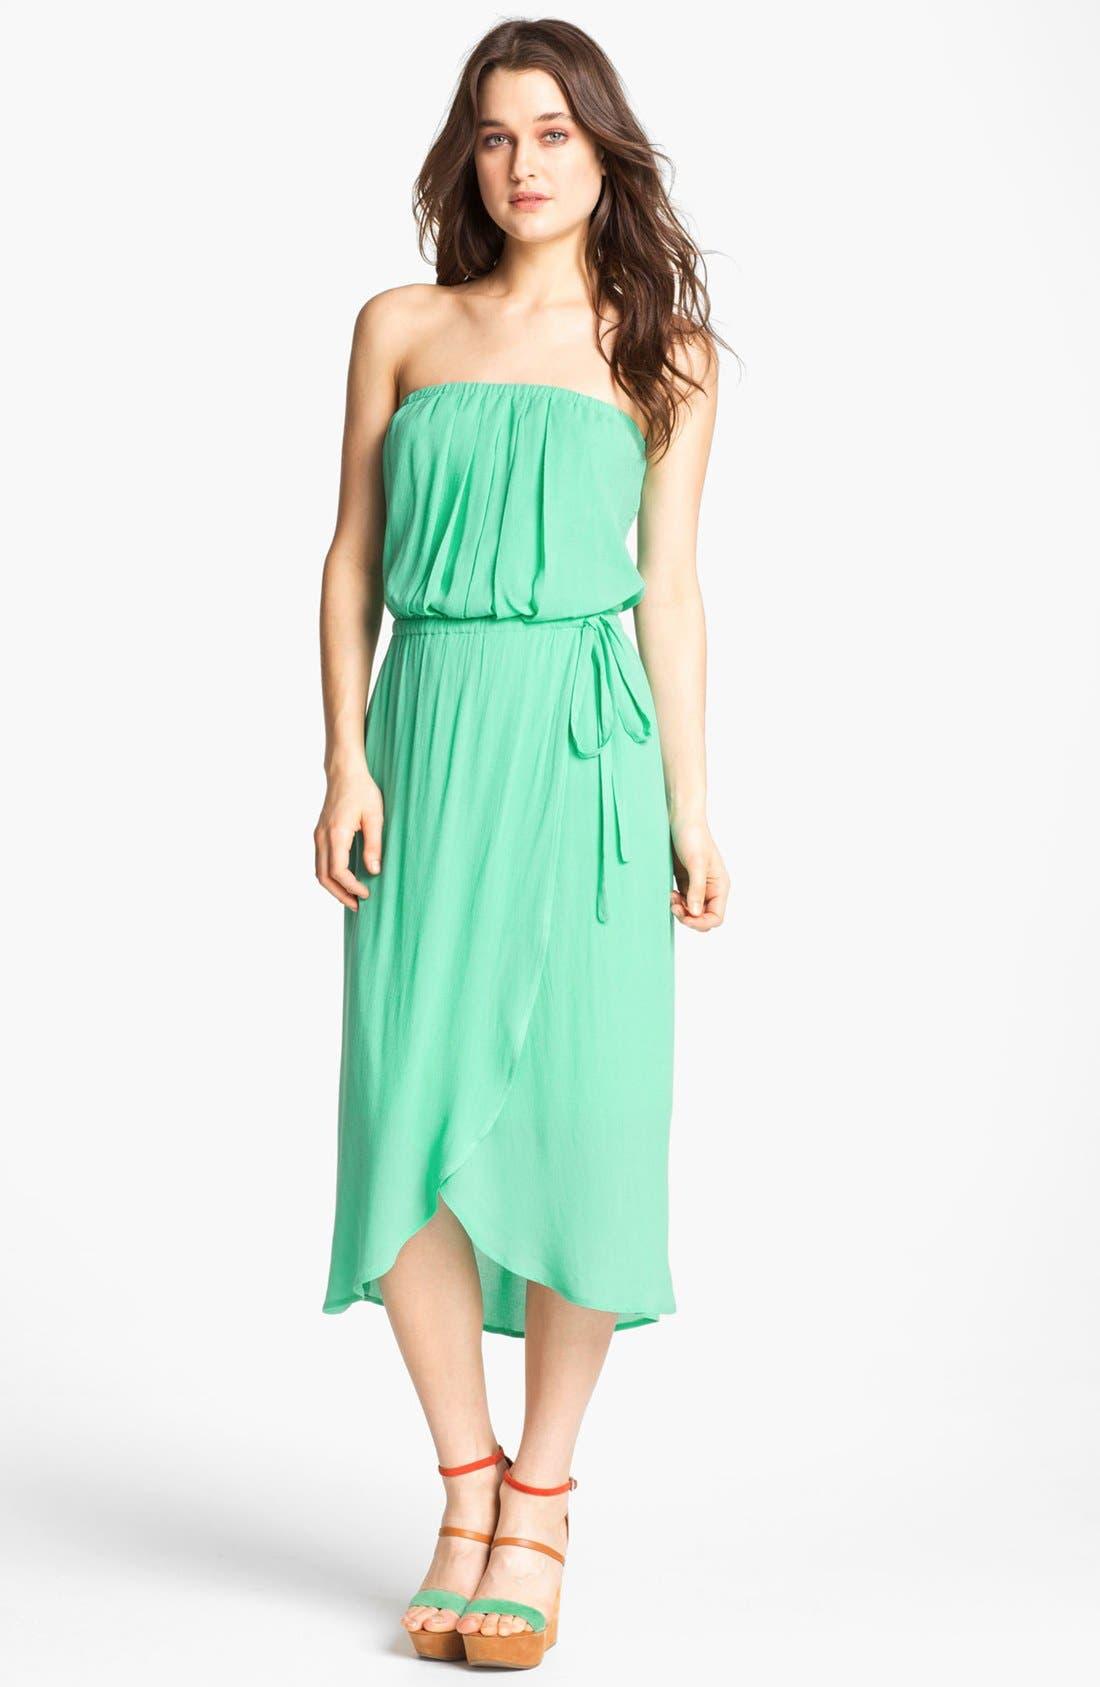 Alternate Image 1 Selected - Ella Moss Strapless Faux Wrap Dress